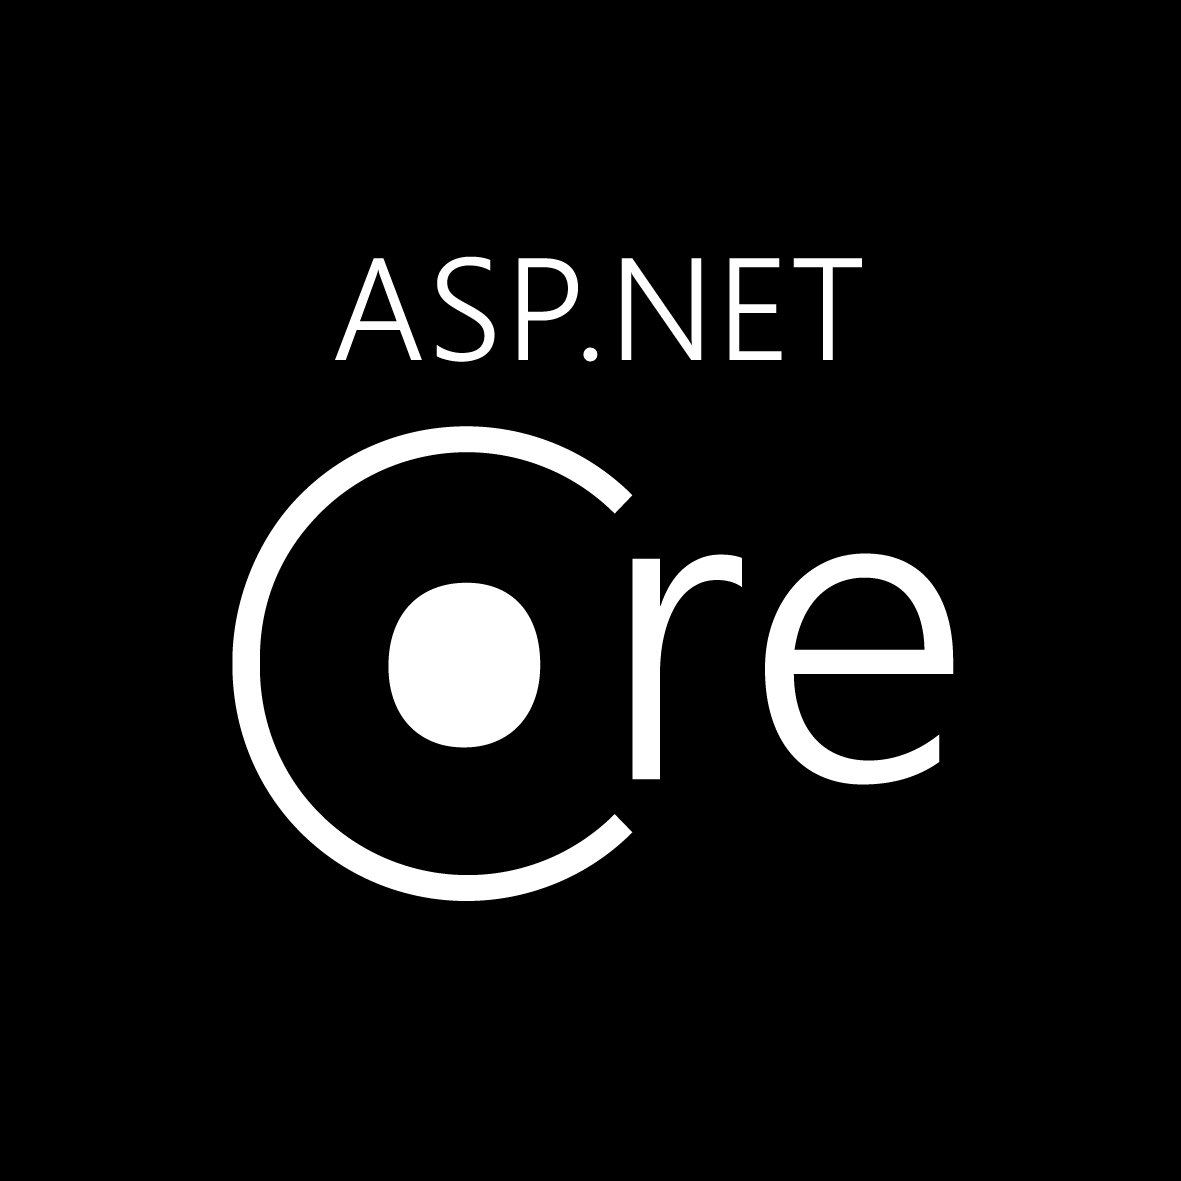 https://raw.githubusercontent.com/campusMVP/dotnetCoreLogoPack/master/ASP.NET%20Core/Bitmap%20RGB/Bitmap-BIG_ASP.NET-Core-Logo_Black_Square_Boxed_RGB.png